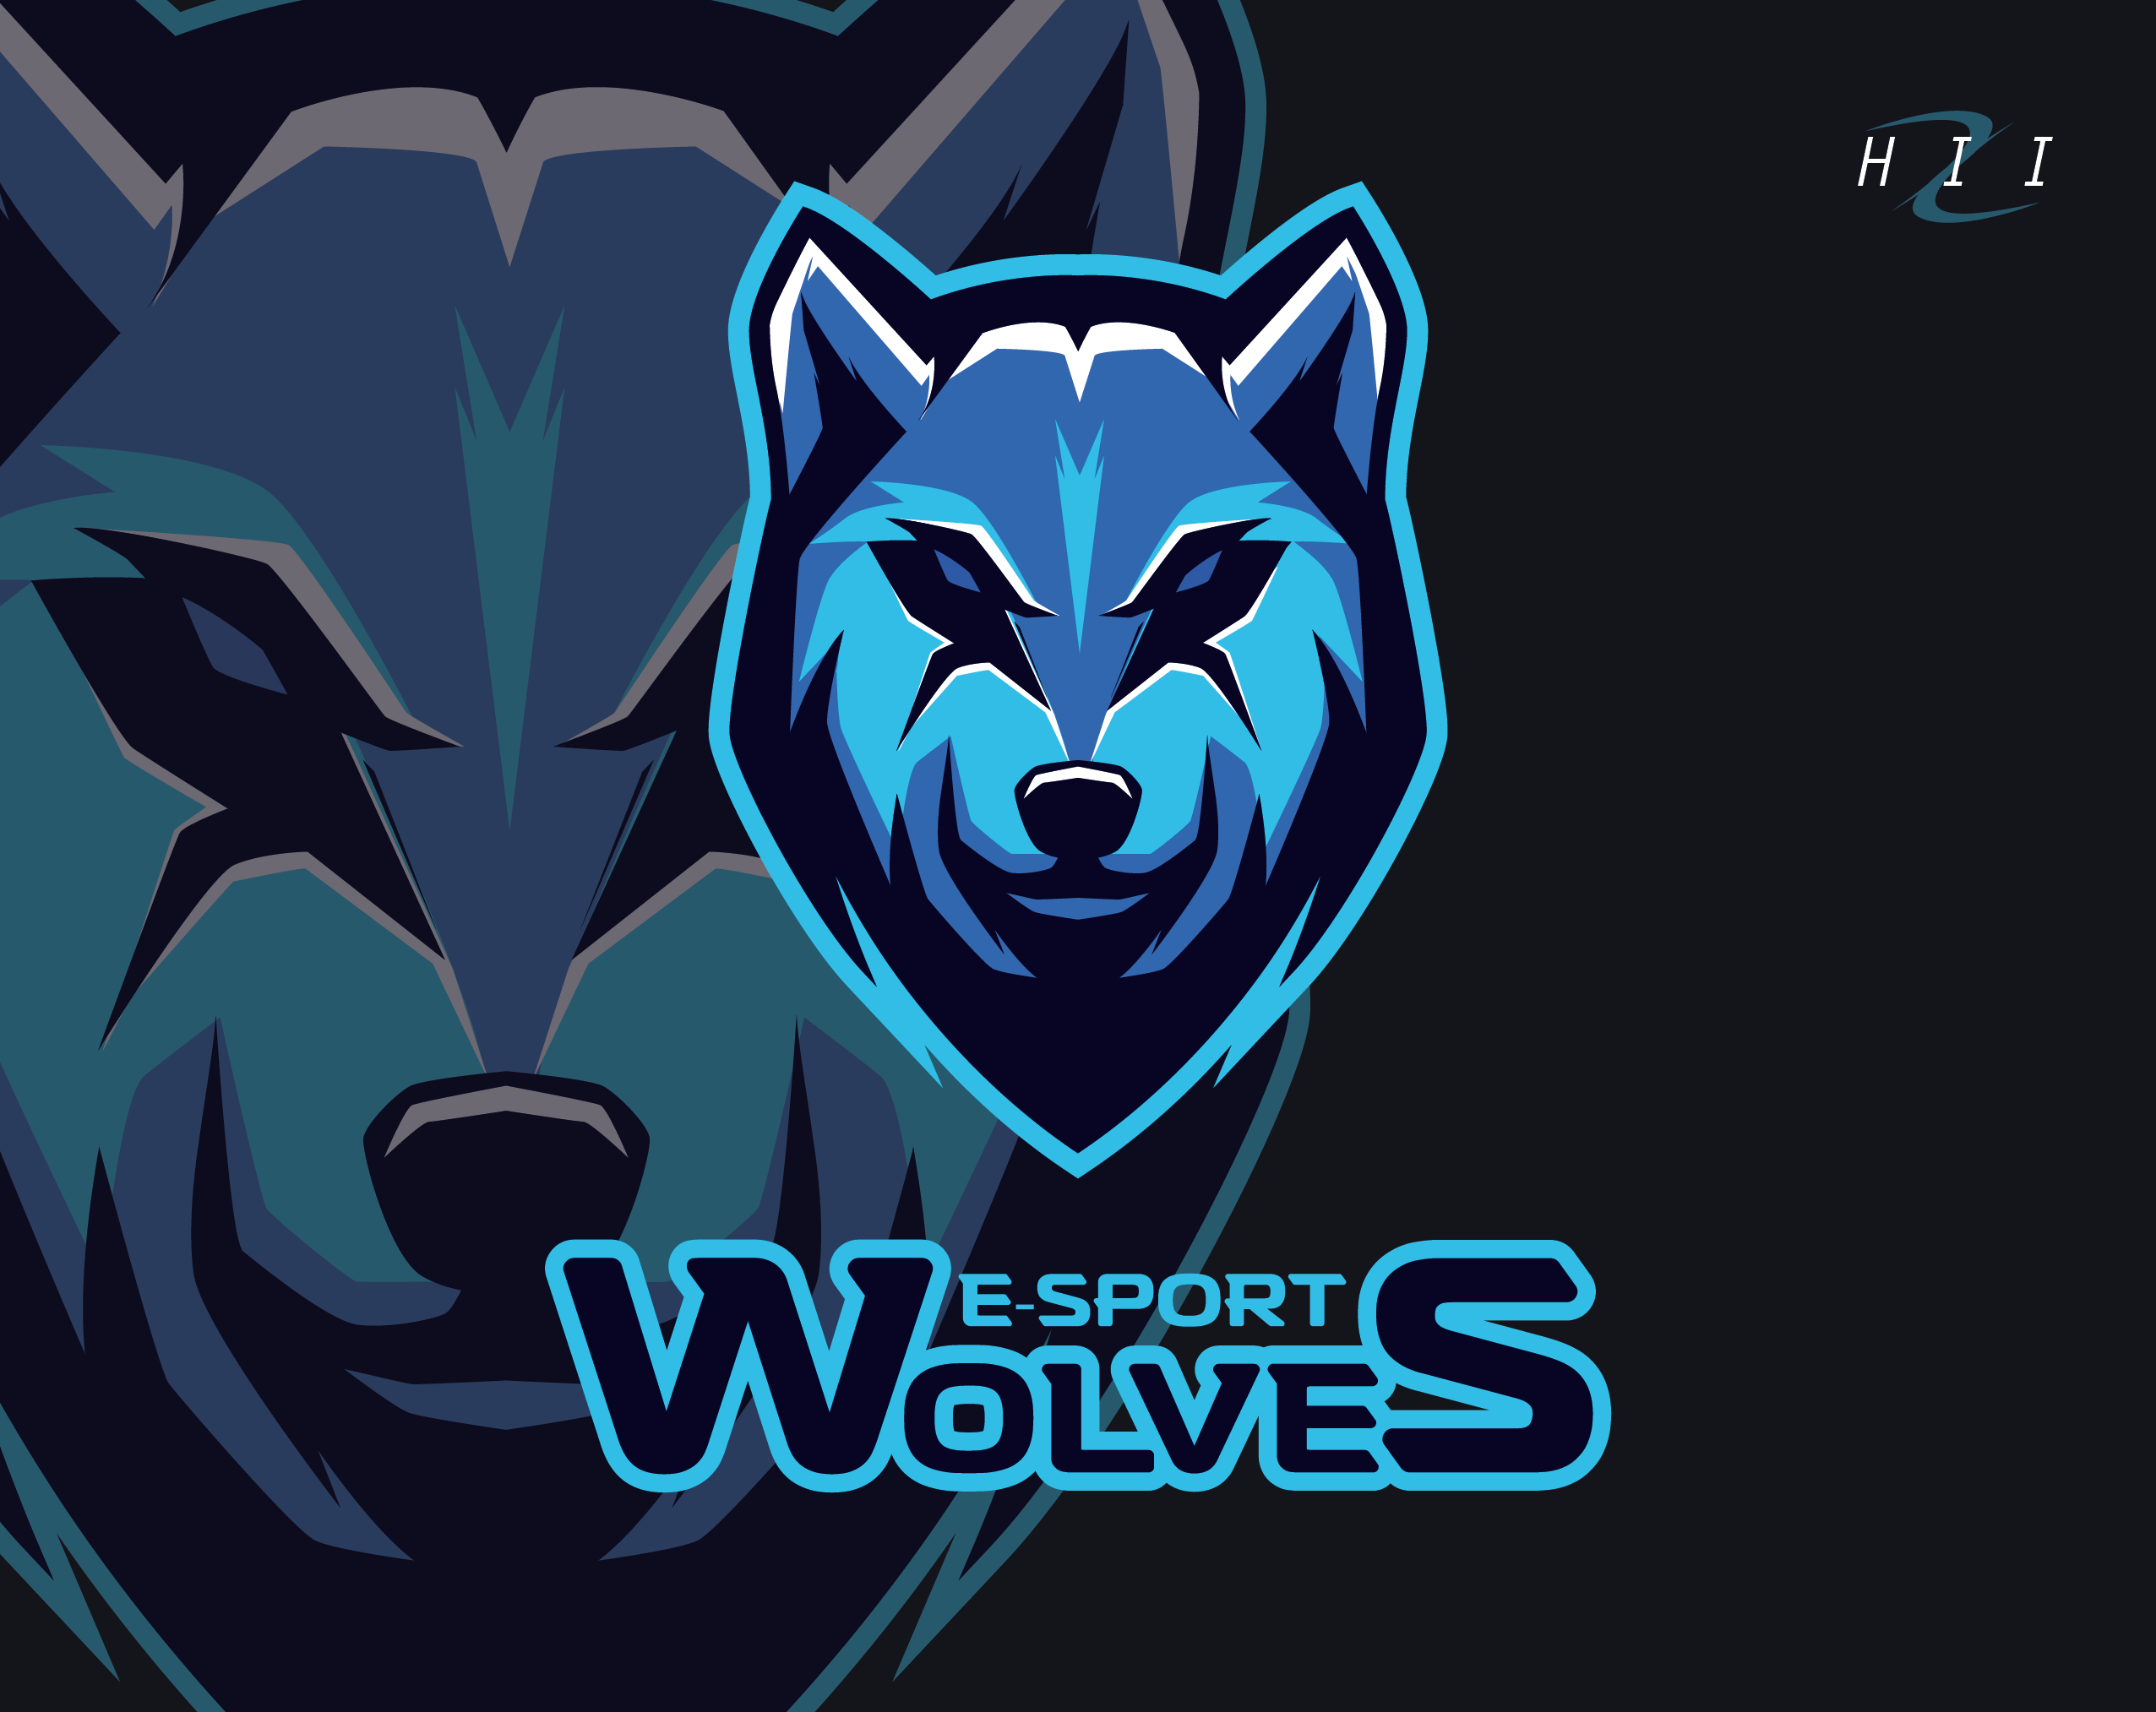 Youtube clipart wolf. Esport wolves logos pinterest